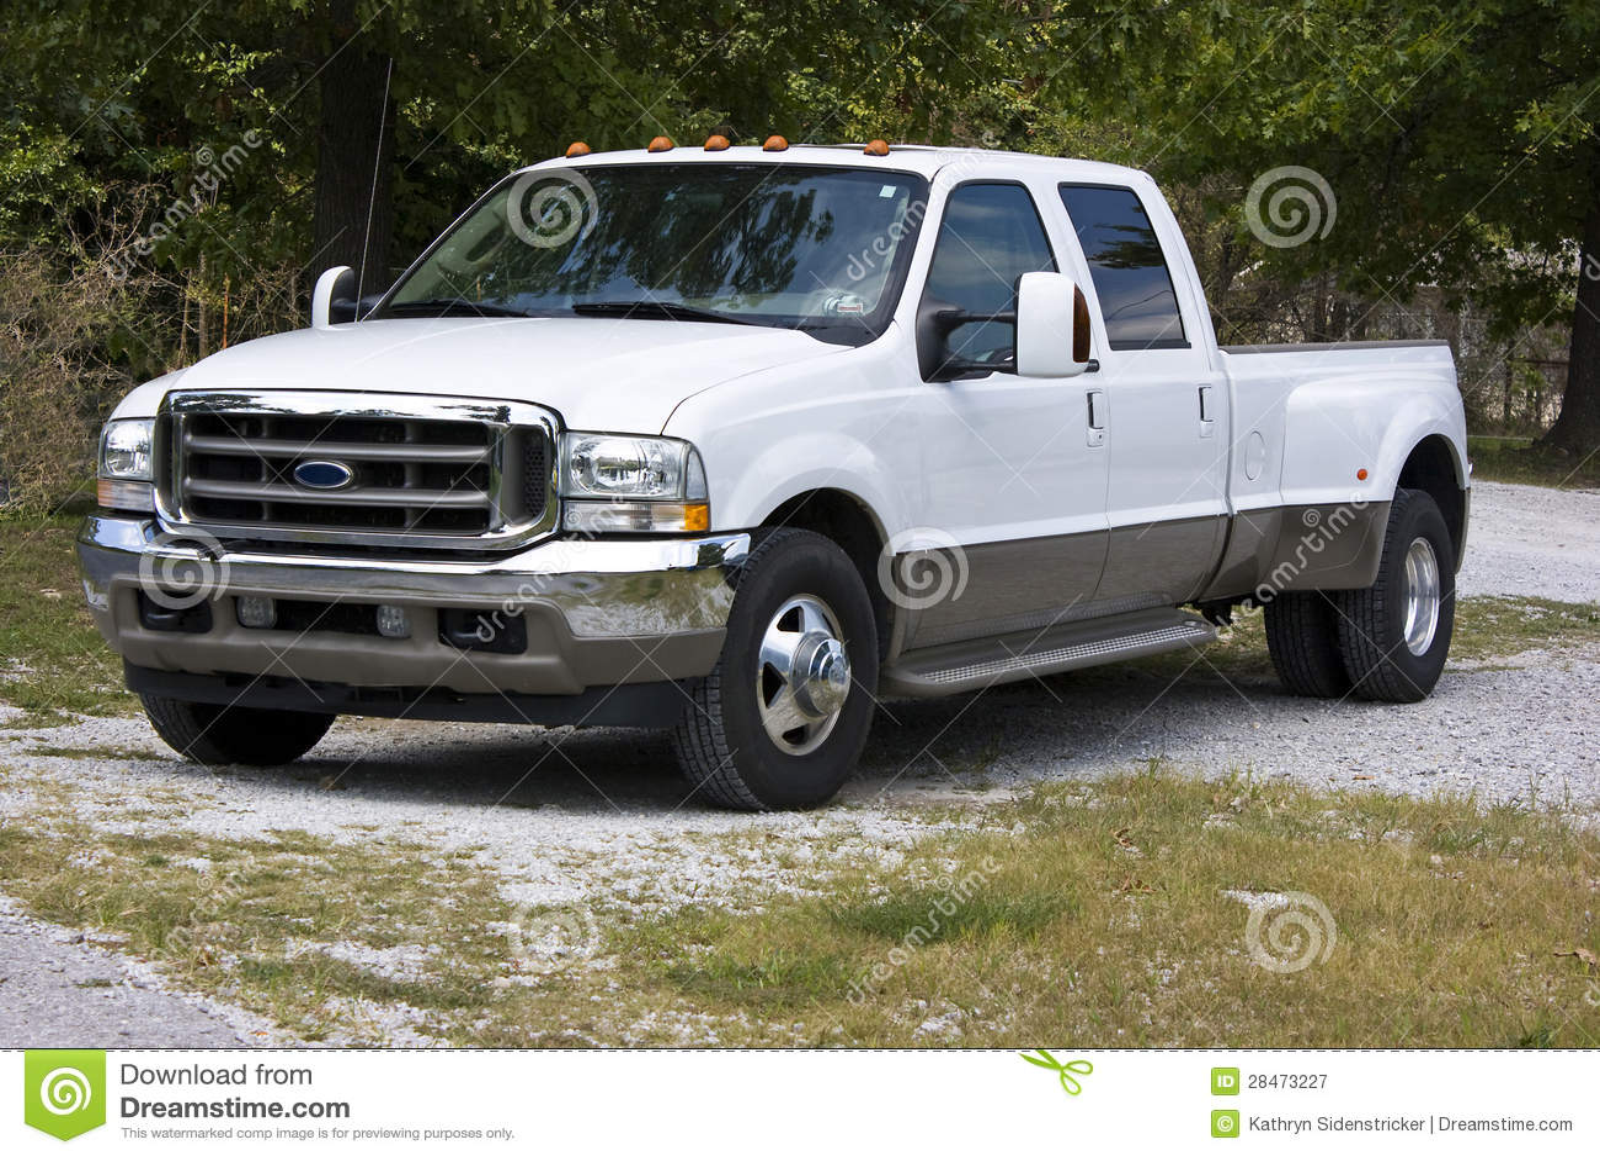 super trucks side prevnext lug cool diesel duty magazine stroke power ford angle engine